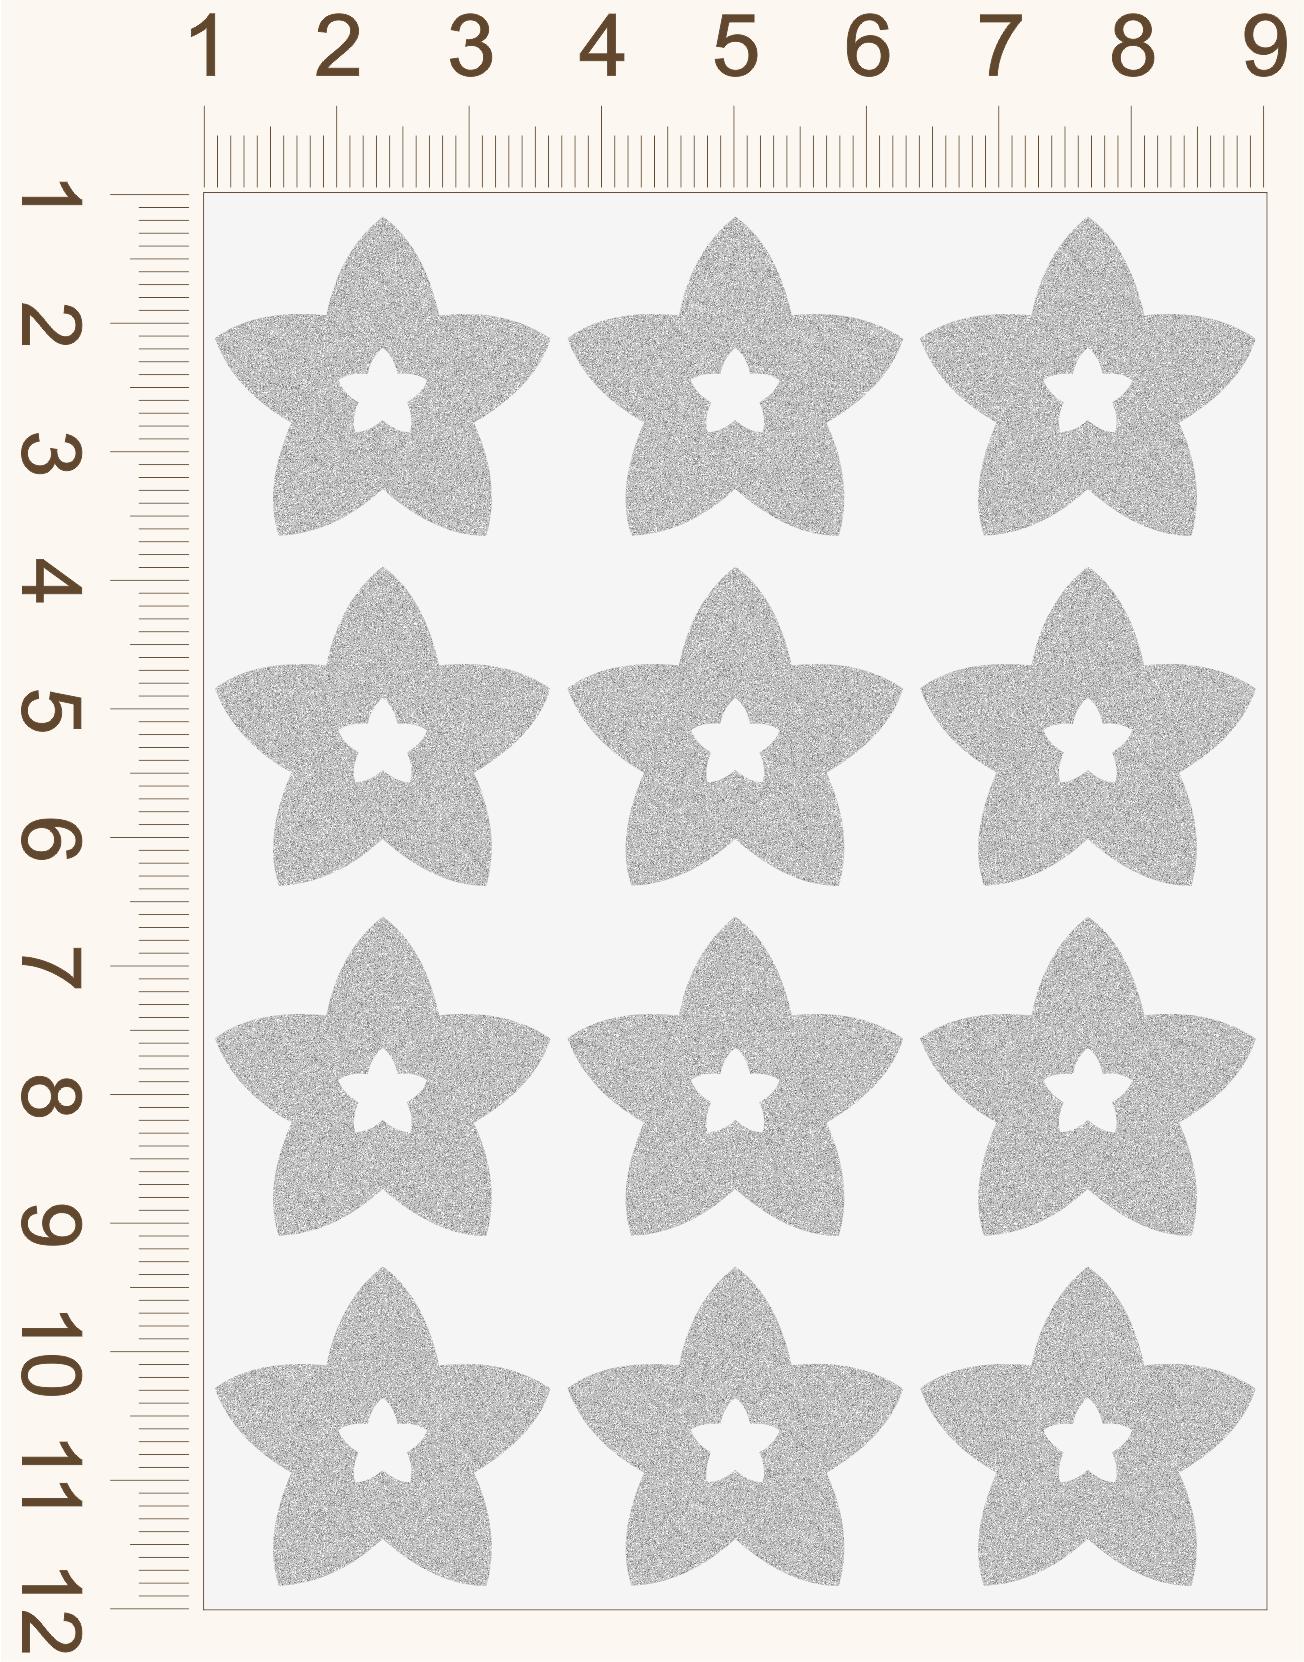 REFLEXNÉ PRVKY Hviezdičky s hviezdičkami 1